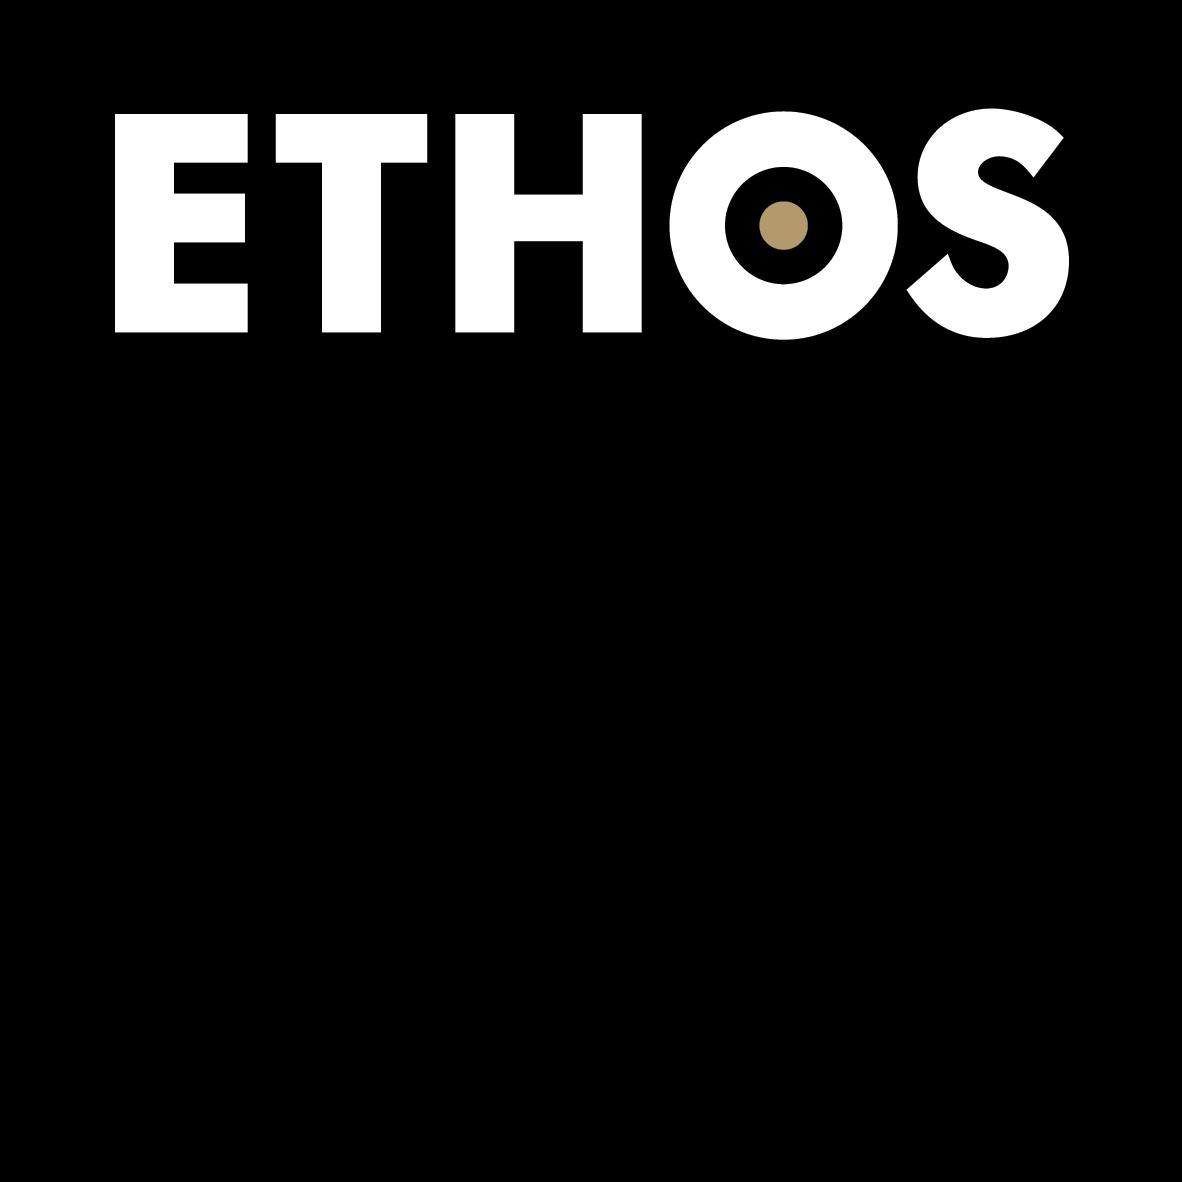 Ethos_Black.jpg